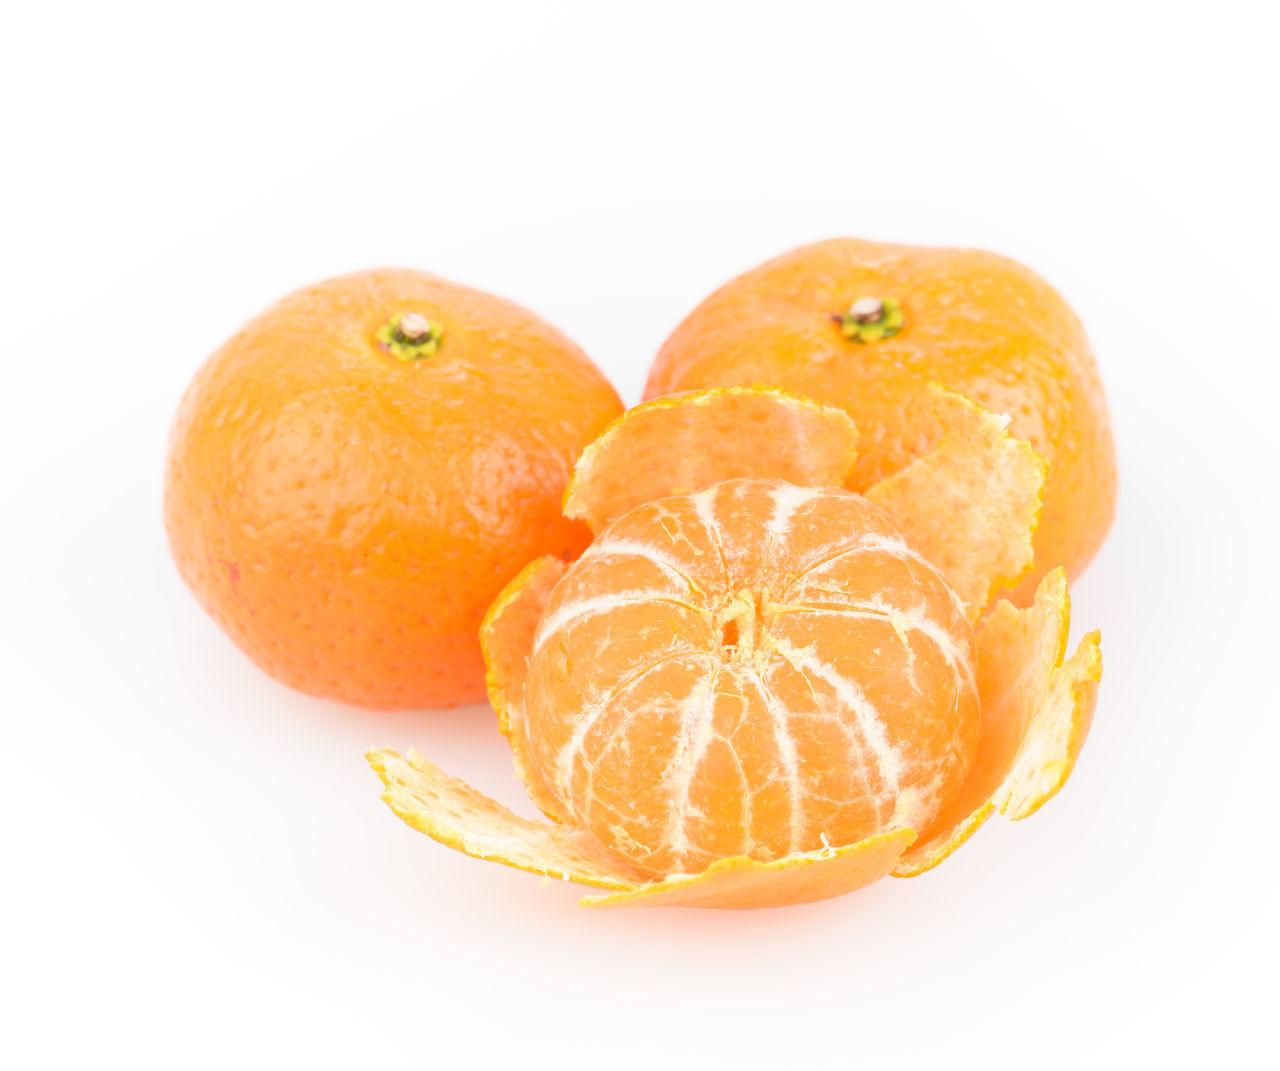 white background, studio shot, fruit, orange - fruit, food and drink, still life, food, healthy eating, orange color, freshness, citrus fruit, close-up, no people, day